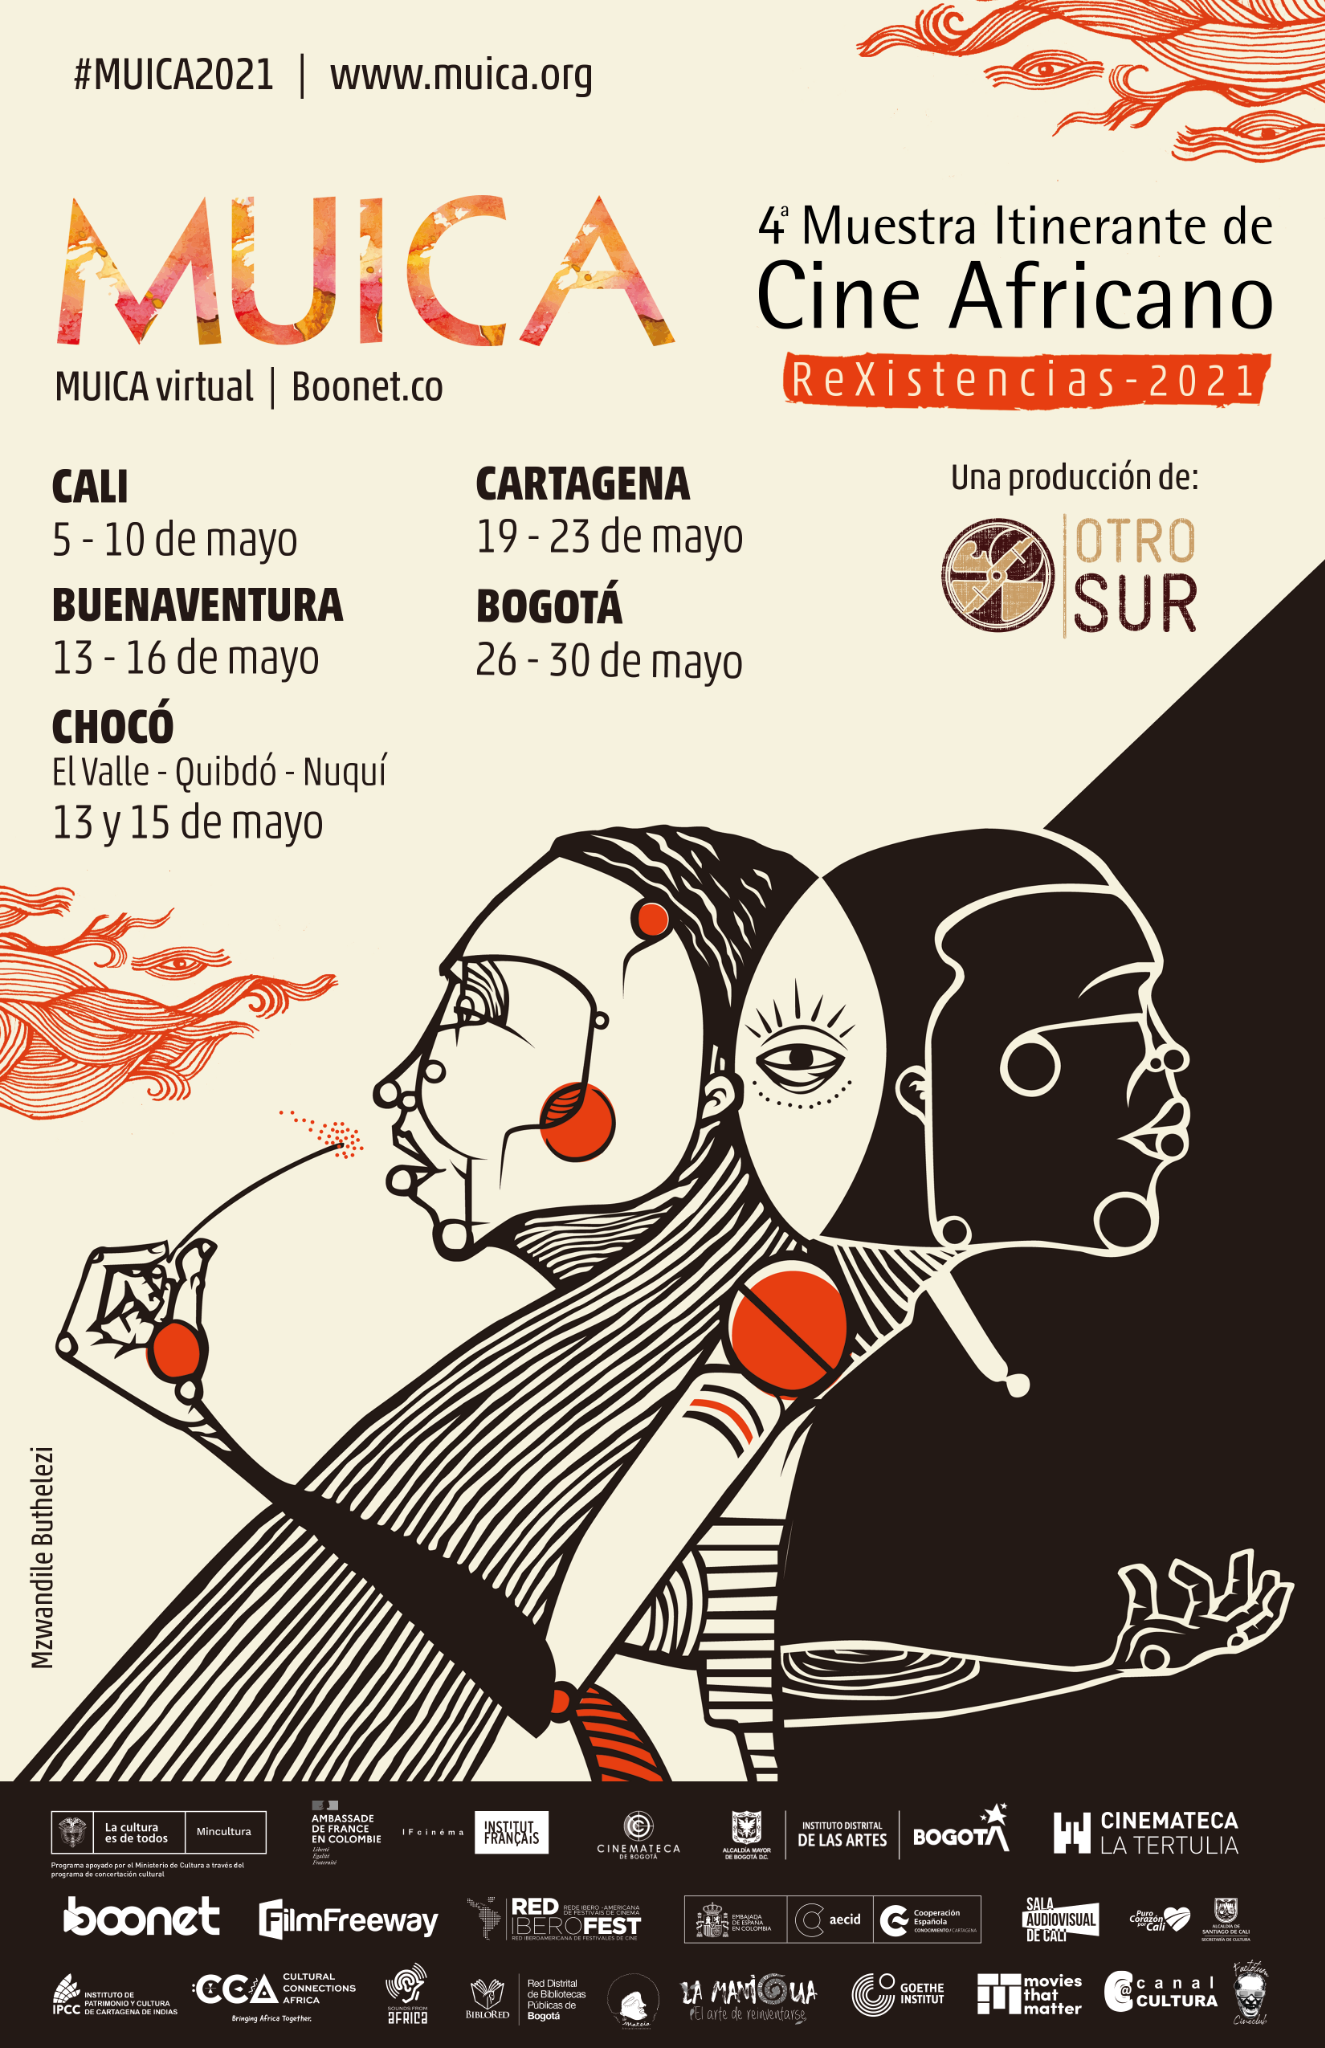 Muestra Itinerante de Cine Africano - MUICA 2021 - POSTER-PRINCIPAL_MUICA_2021_version_final